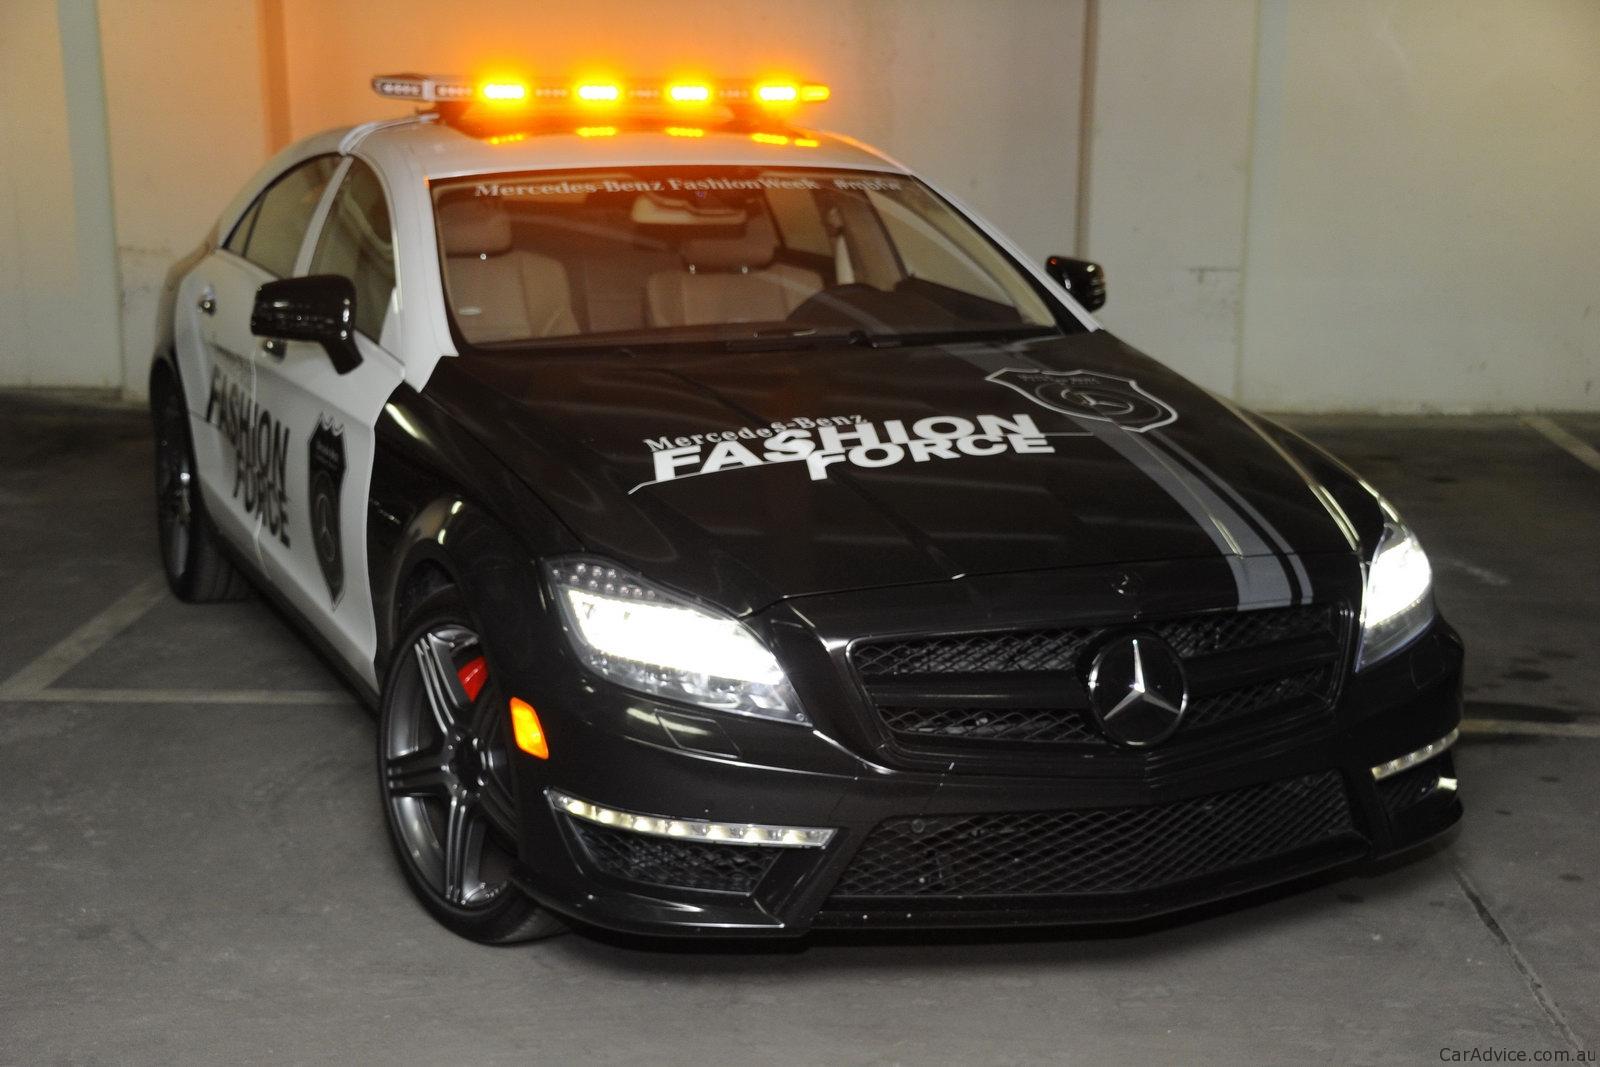 Audi A8 W12 >> 2012 Mercedes-Benz CLS63 Fashion Force patrol car - photos | CarAdvice